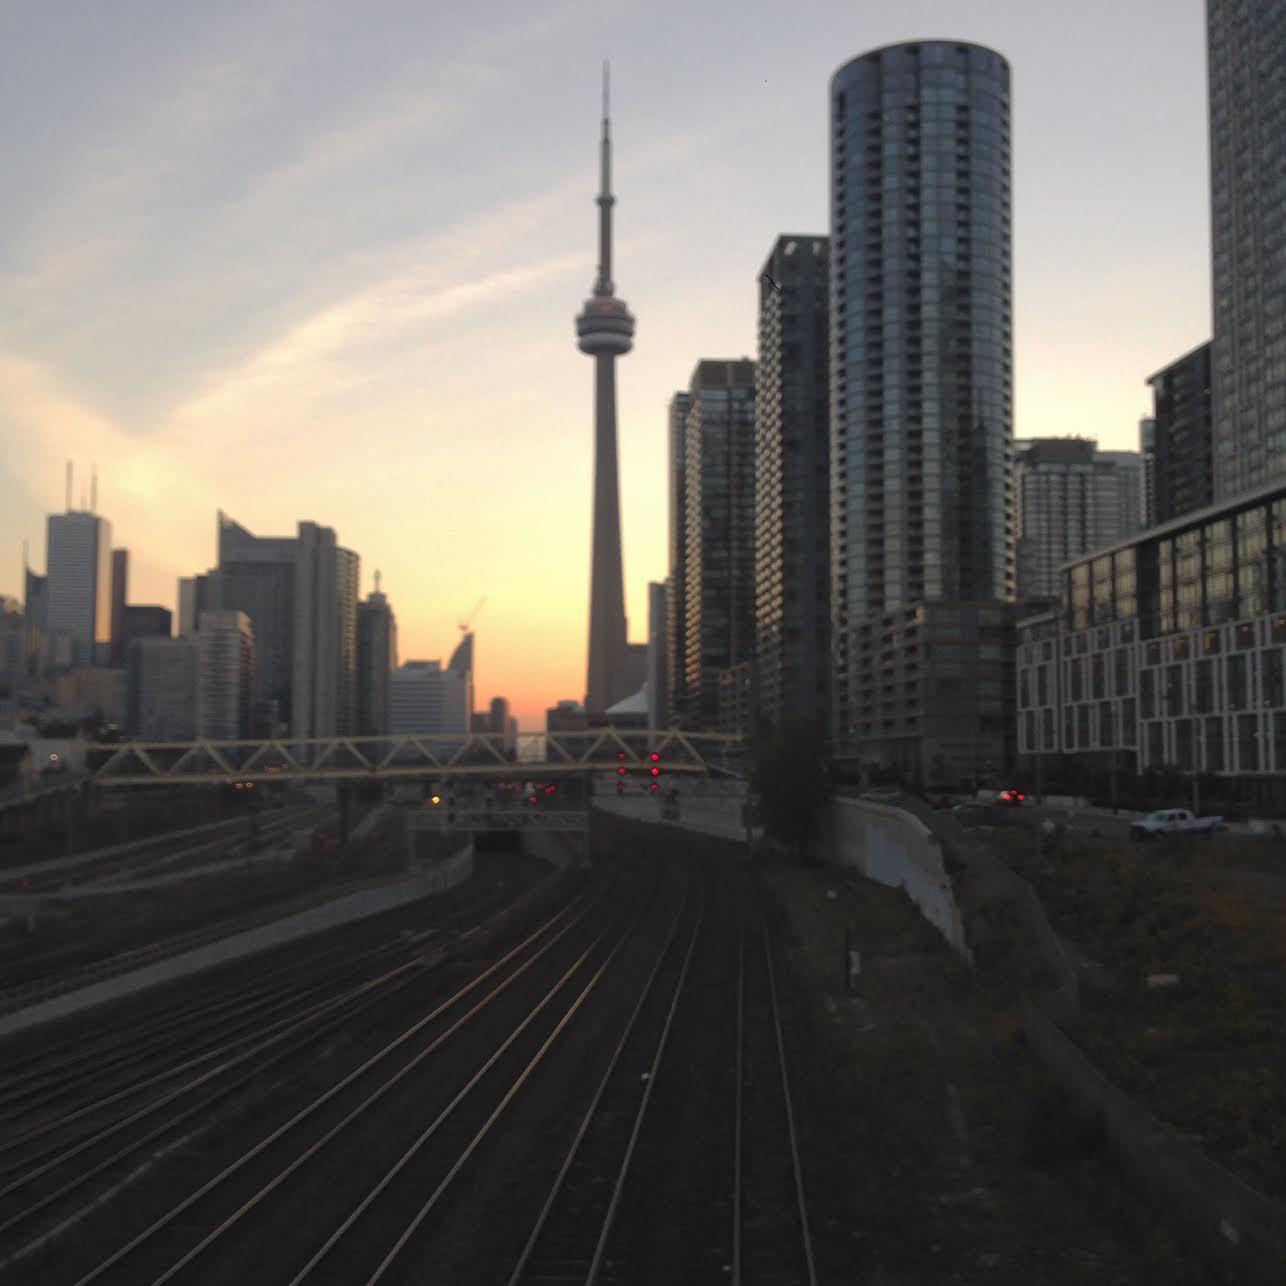 Sunrise in downtown Toronto, Fall 2015.